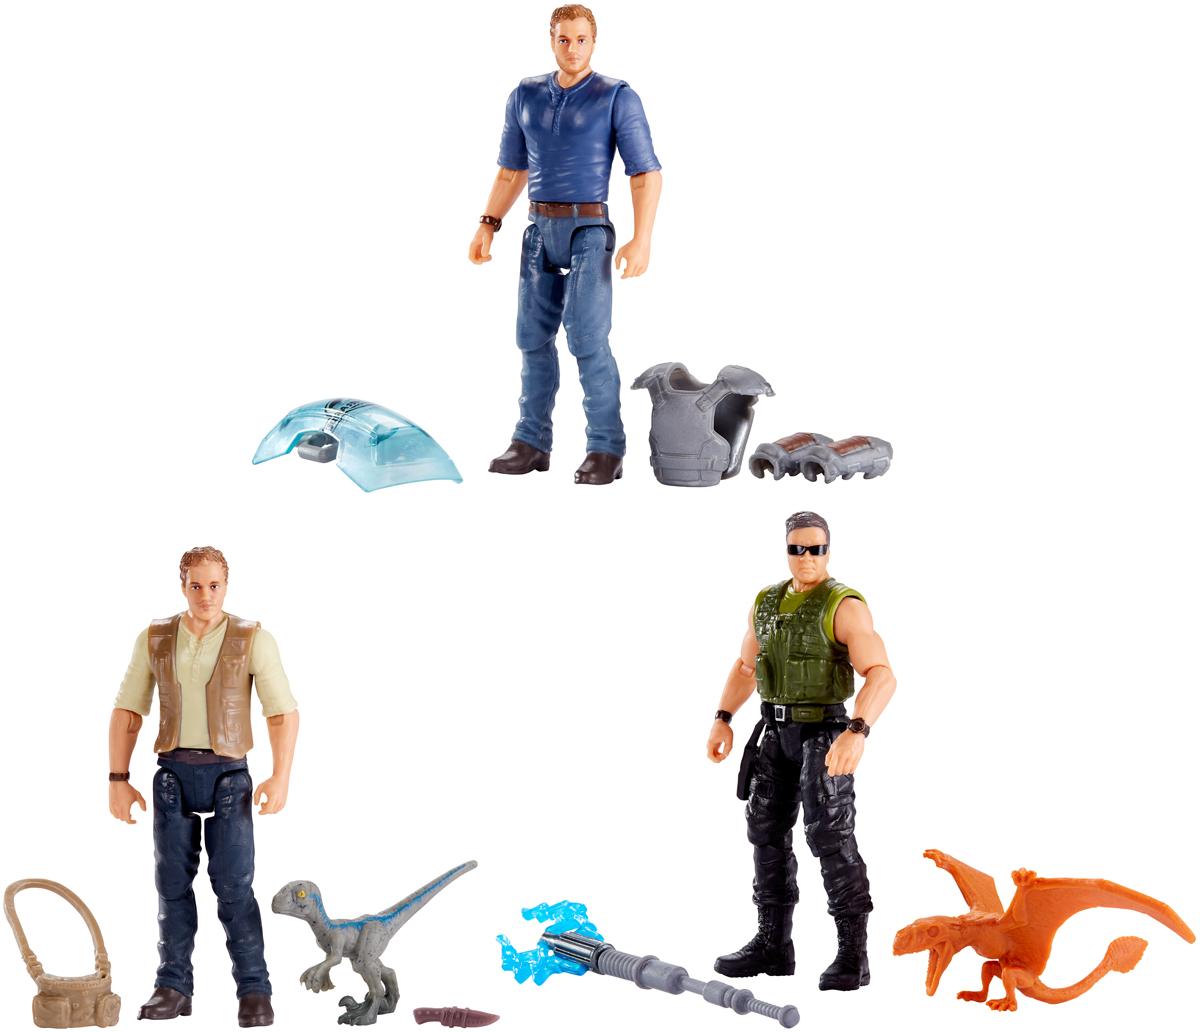 Jurassic World Базовые фигурки героев